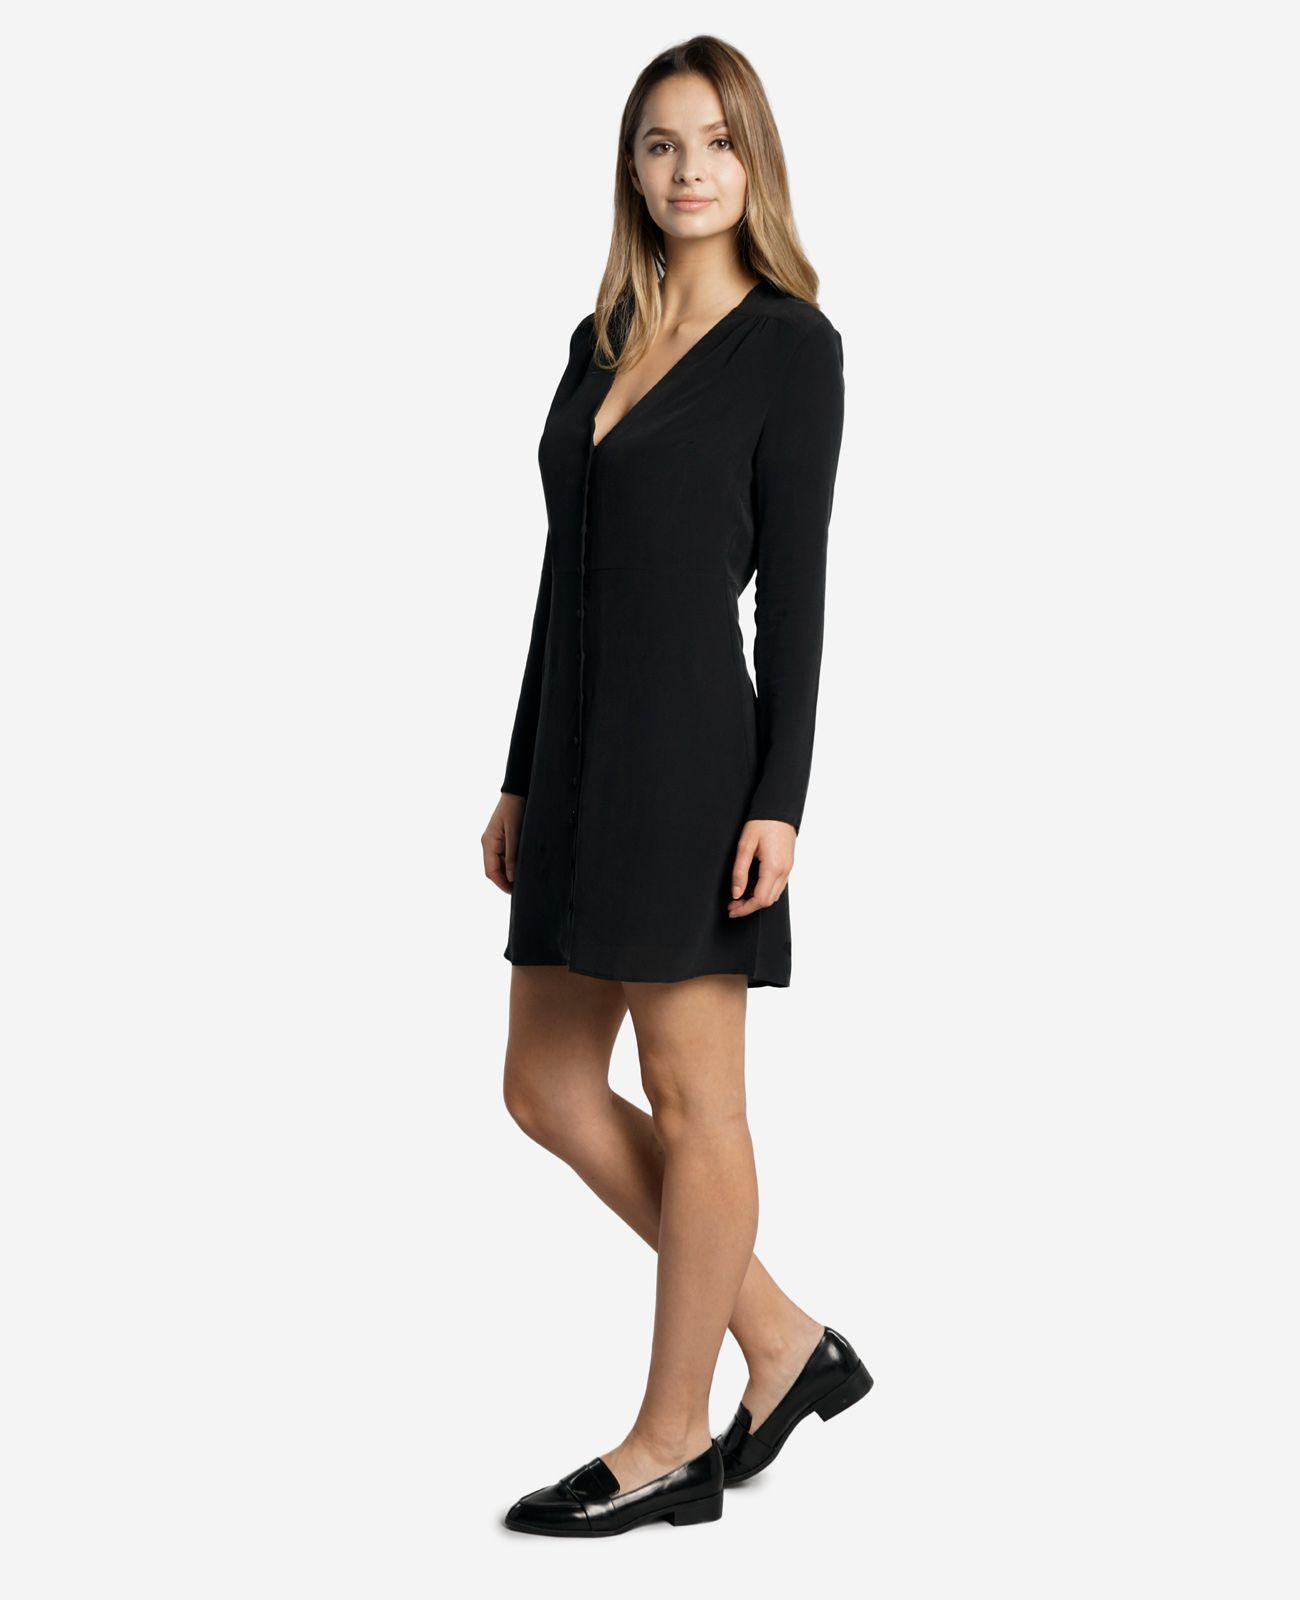 Womenus silk long sleeve tailored dress fashion springsummer